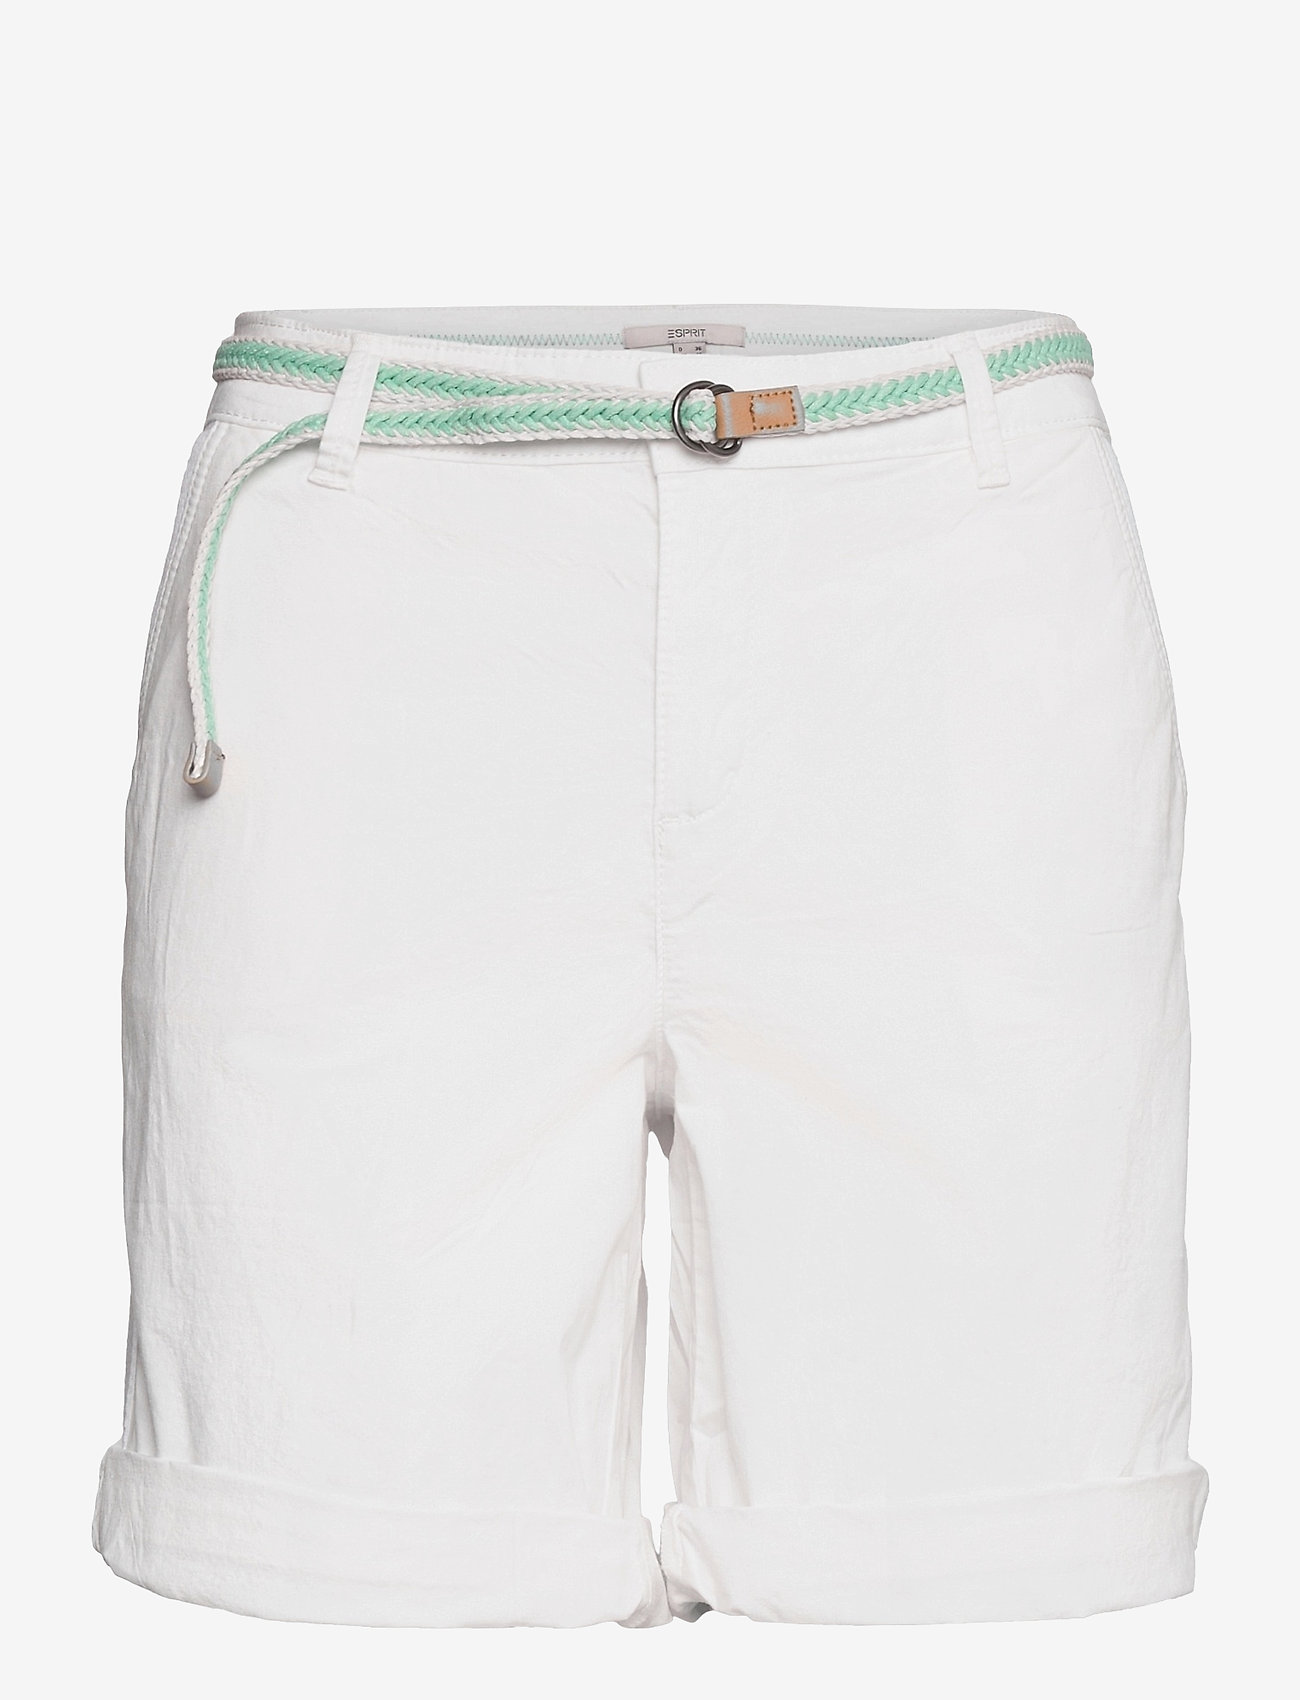 Esprit Casual - Shorts woven - chino shorts - white - 0